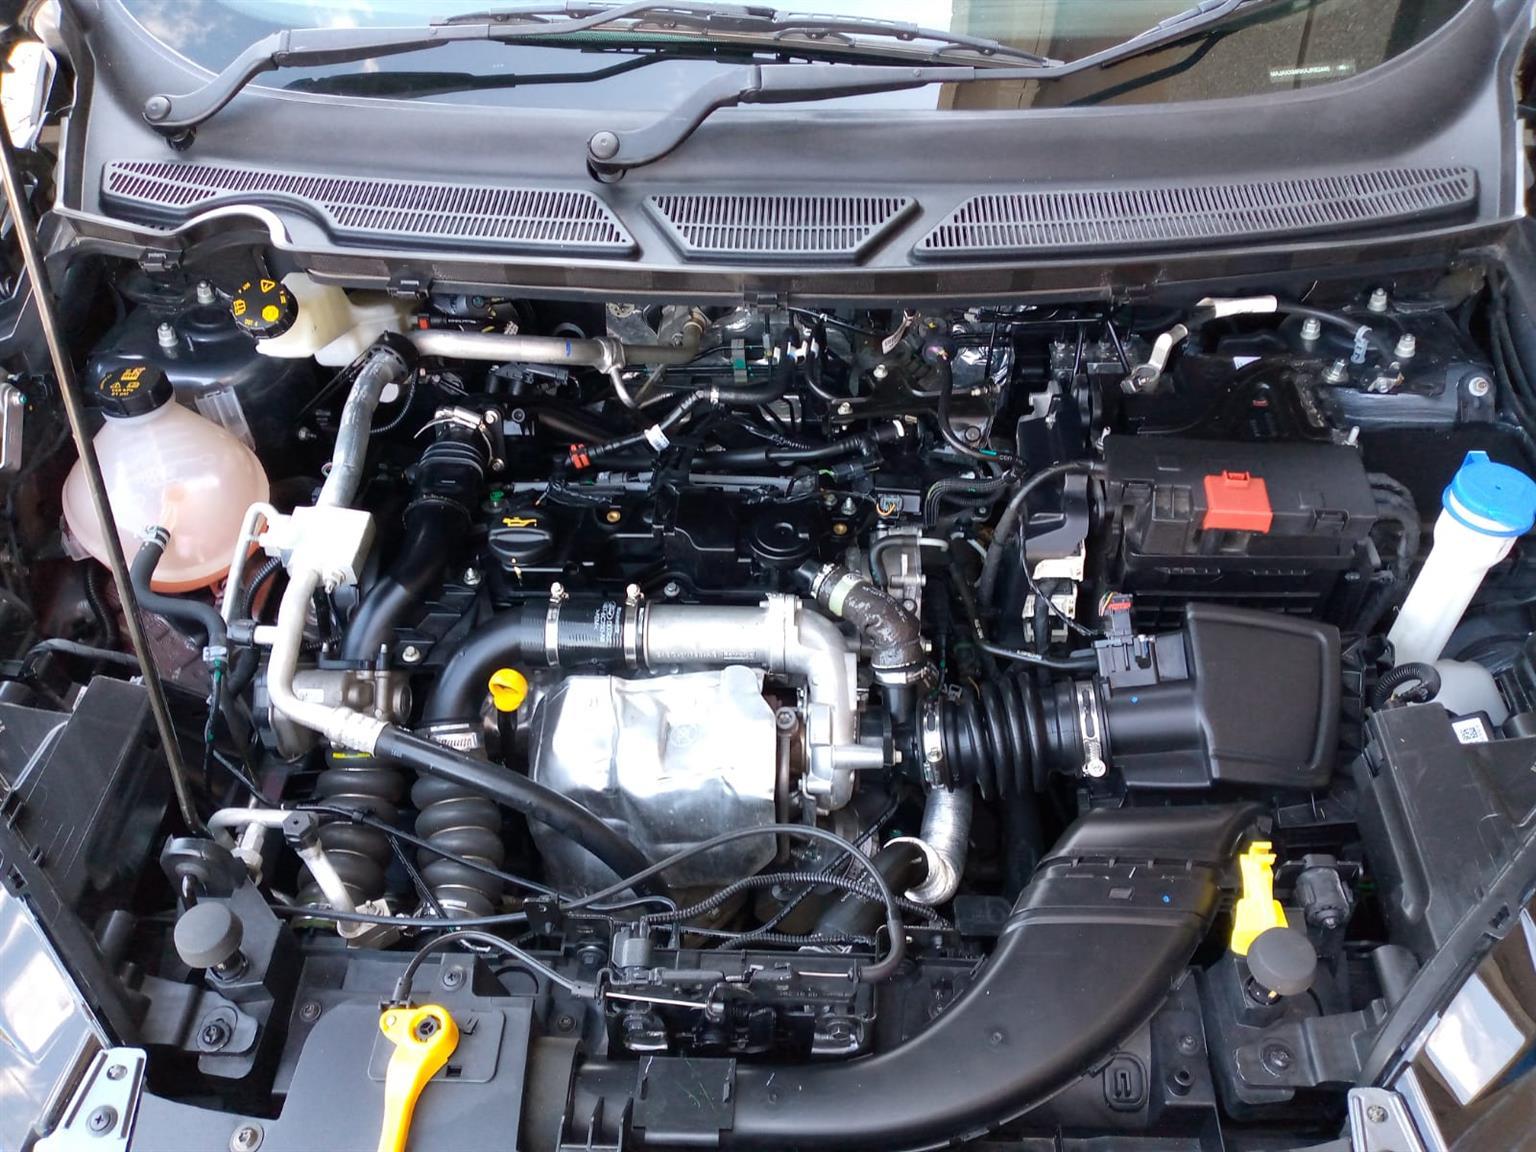 Ford Ecosport TDCi 1.5 Trend 2018